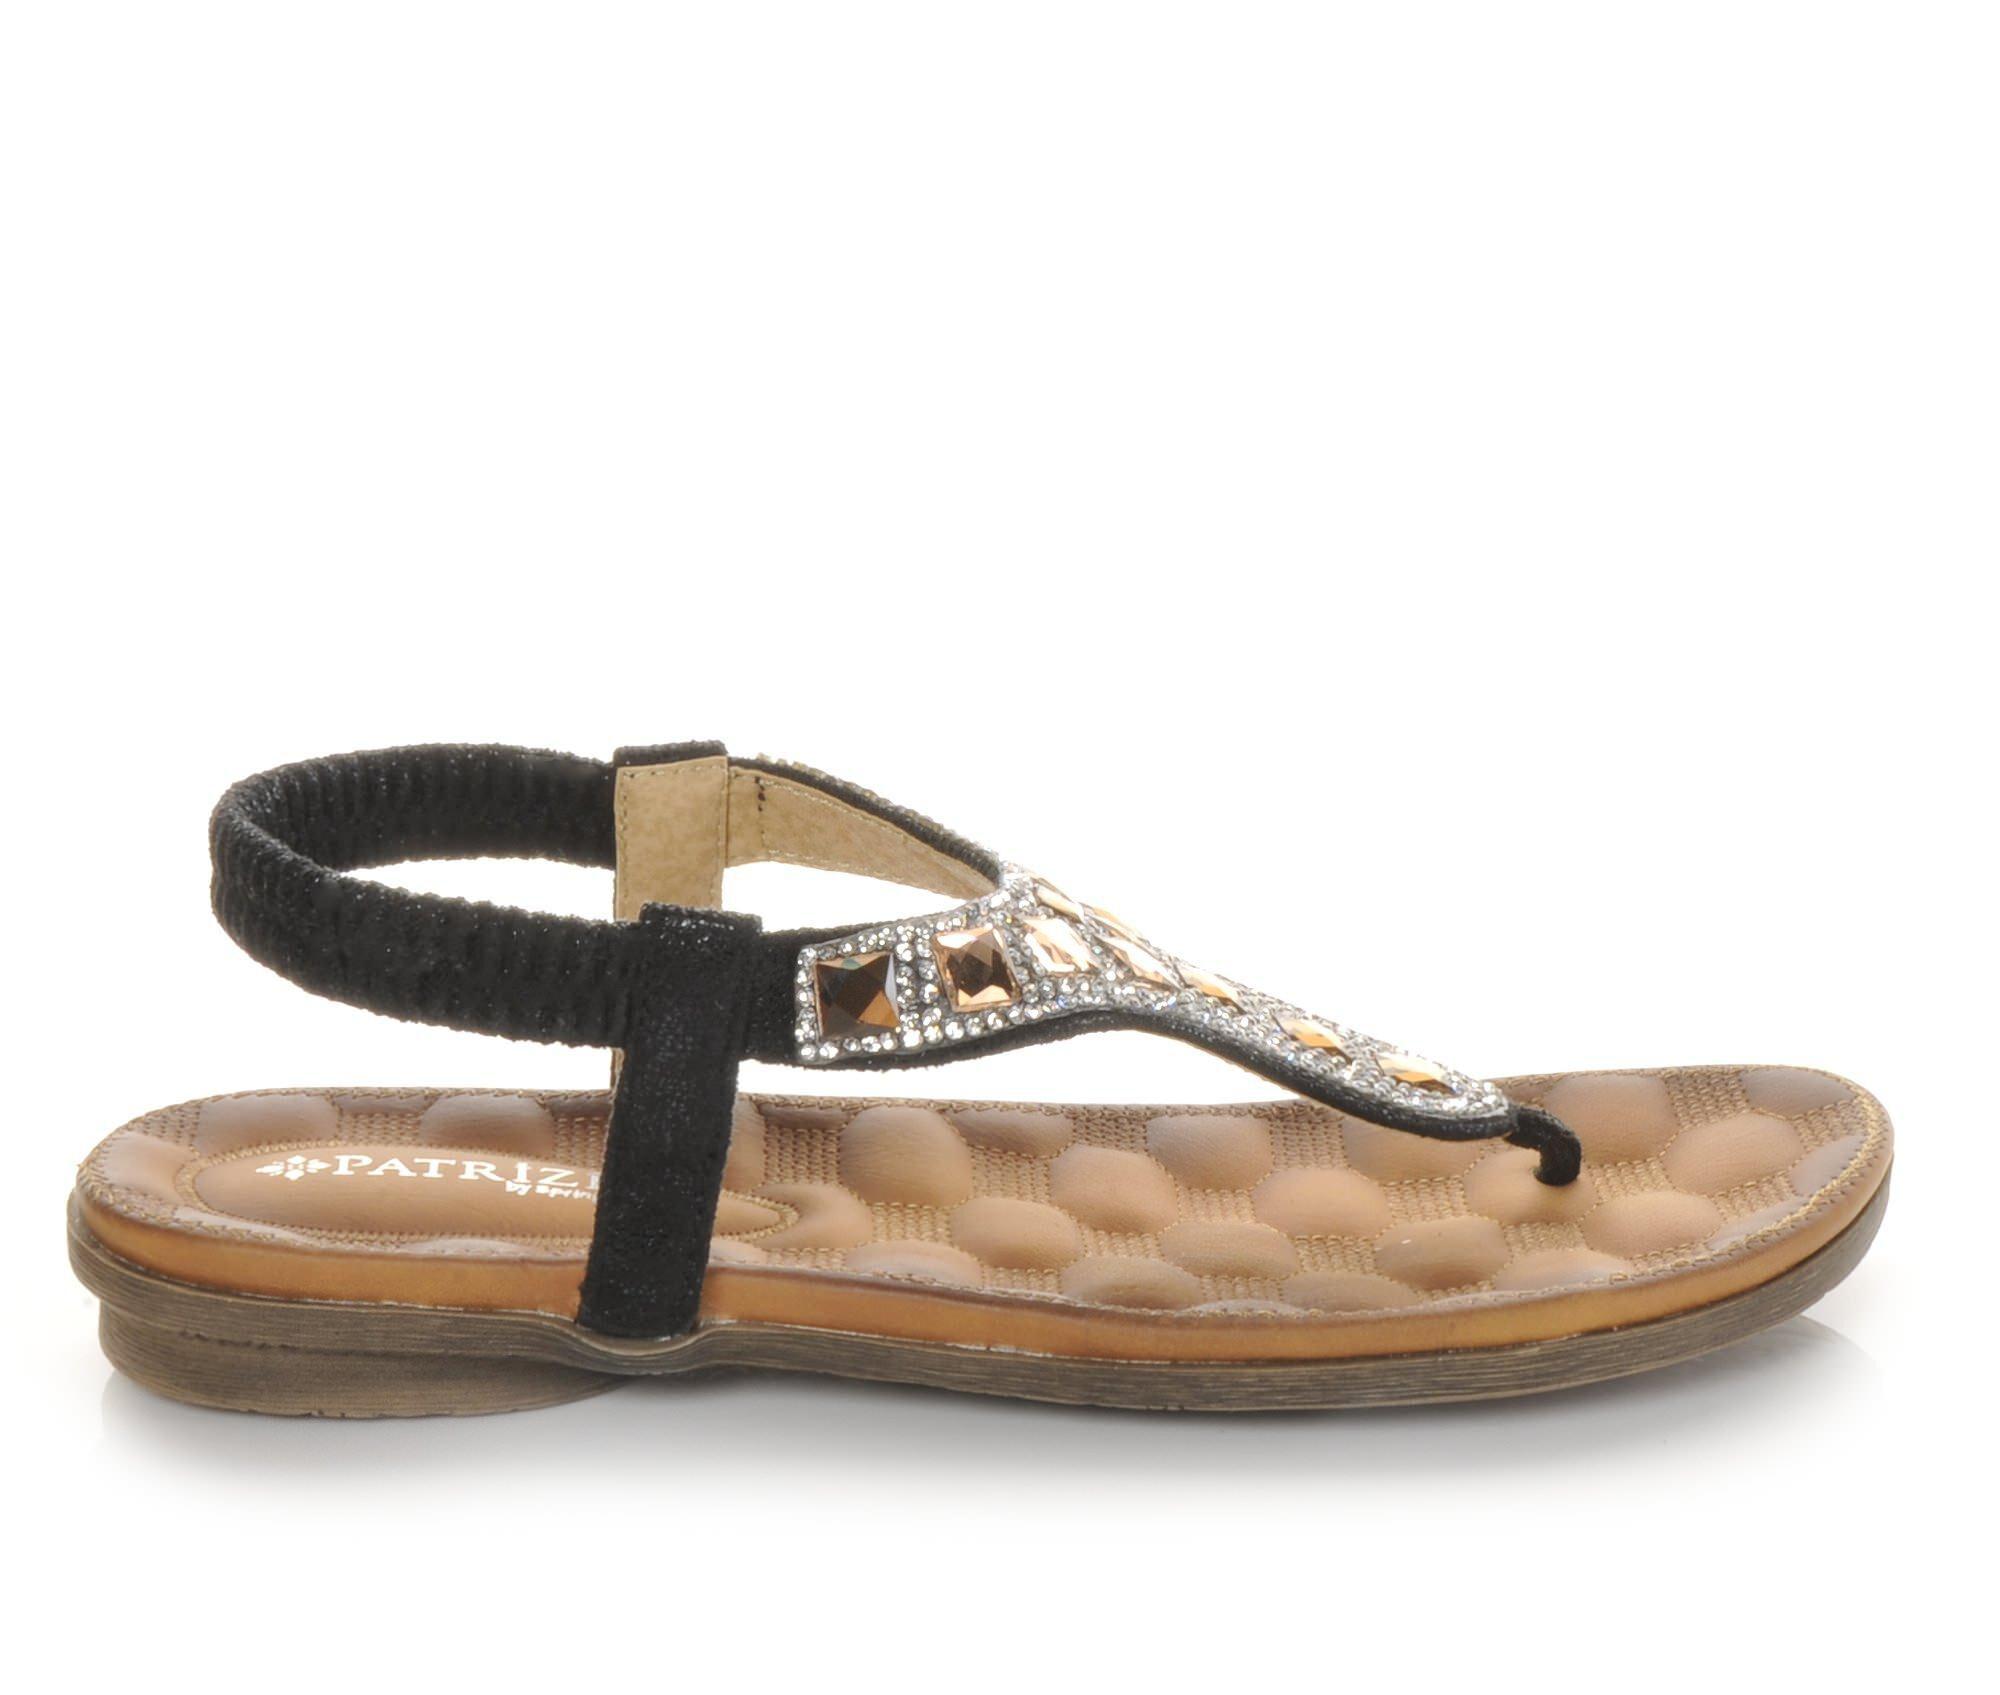 Womens Sandals PATRIZIA Emil Khaki